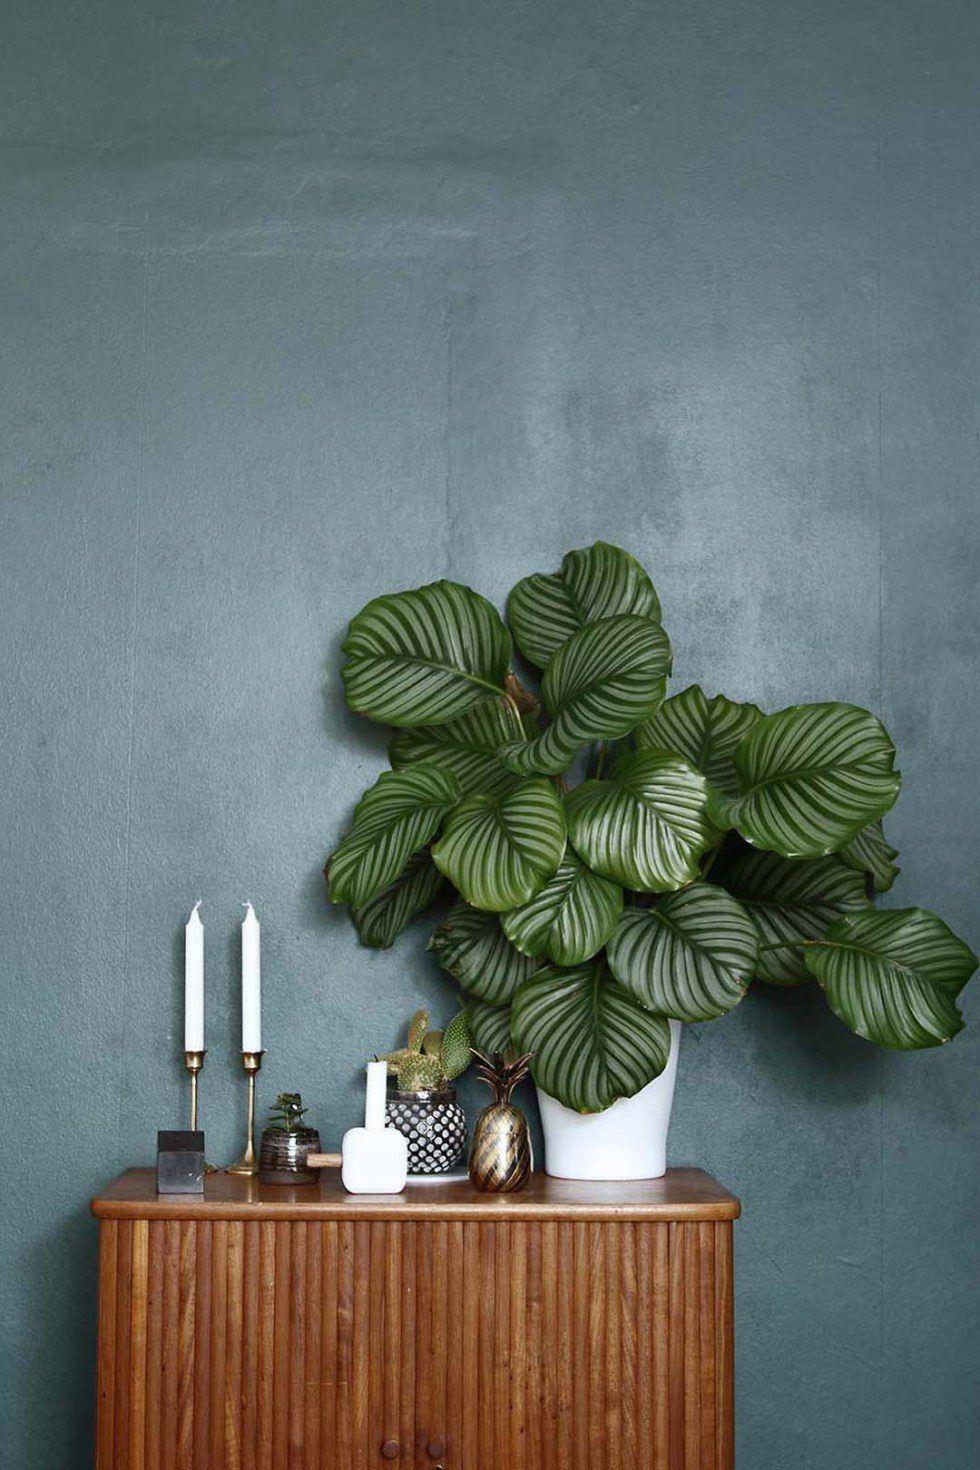 urban-jungle-design-inspiration-decorating-with-plants